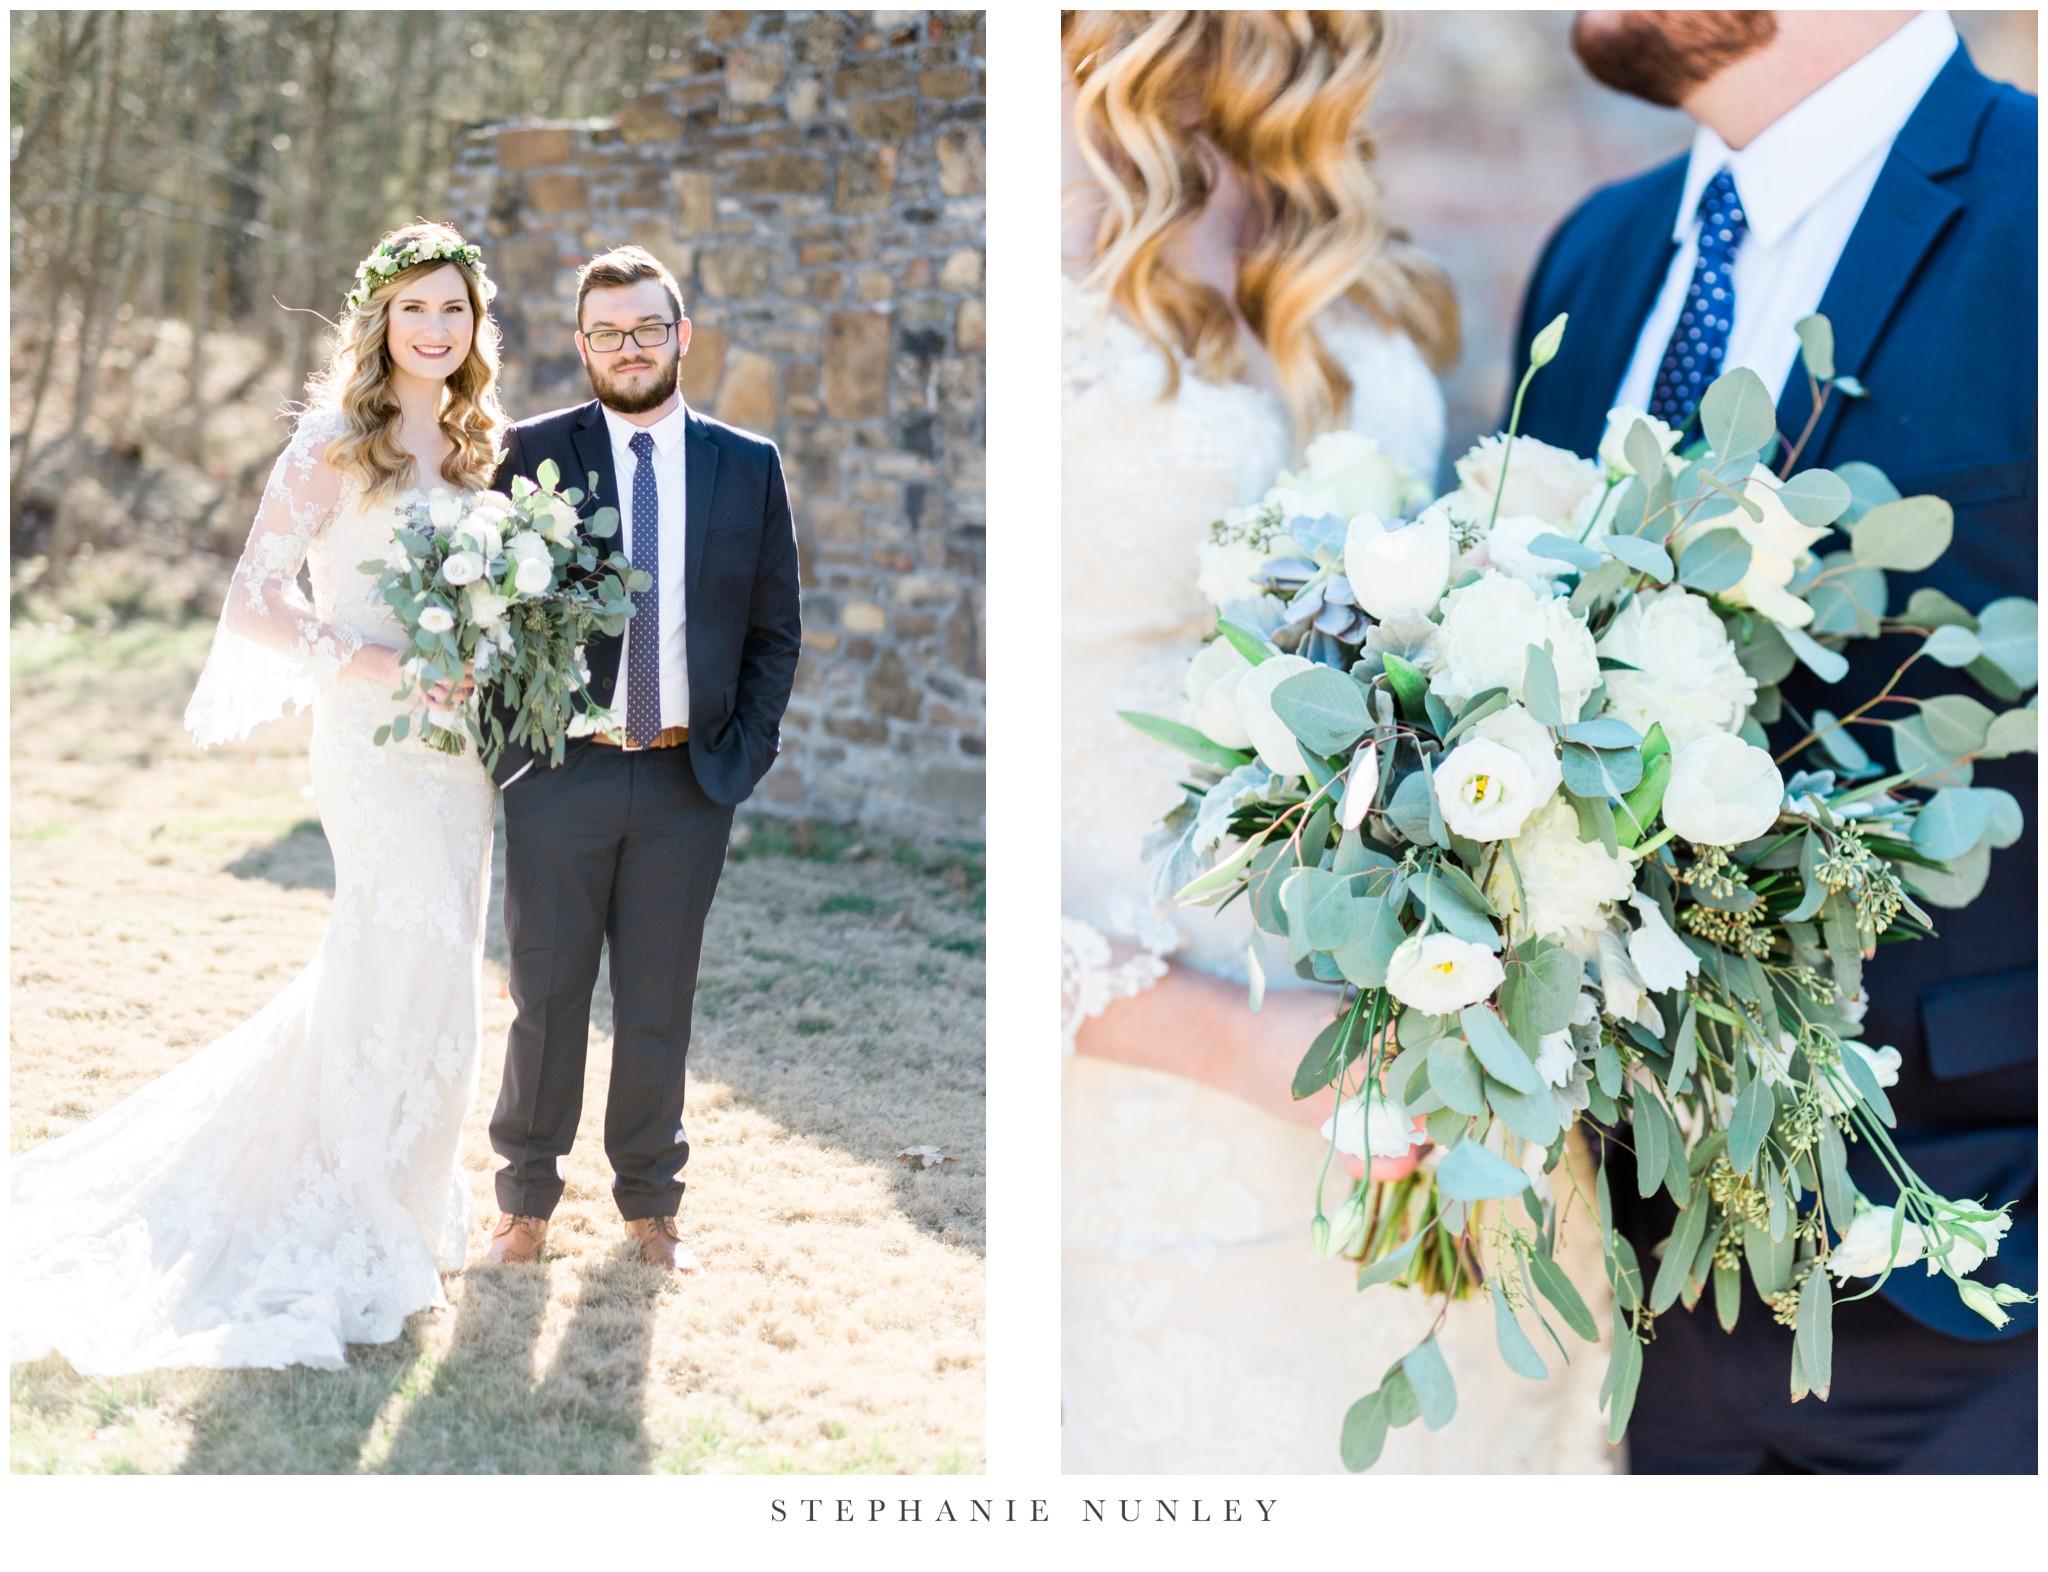 sassafrass-springs-vineyard-film-wedding-photos-33.jpg